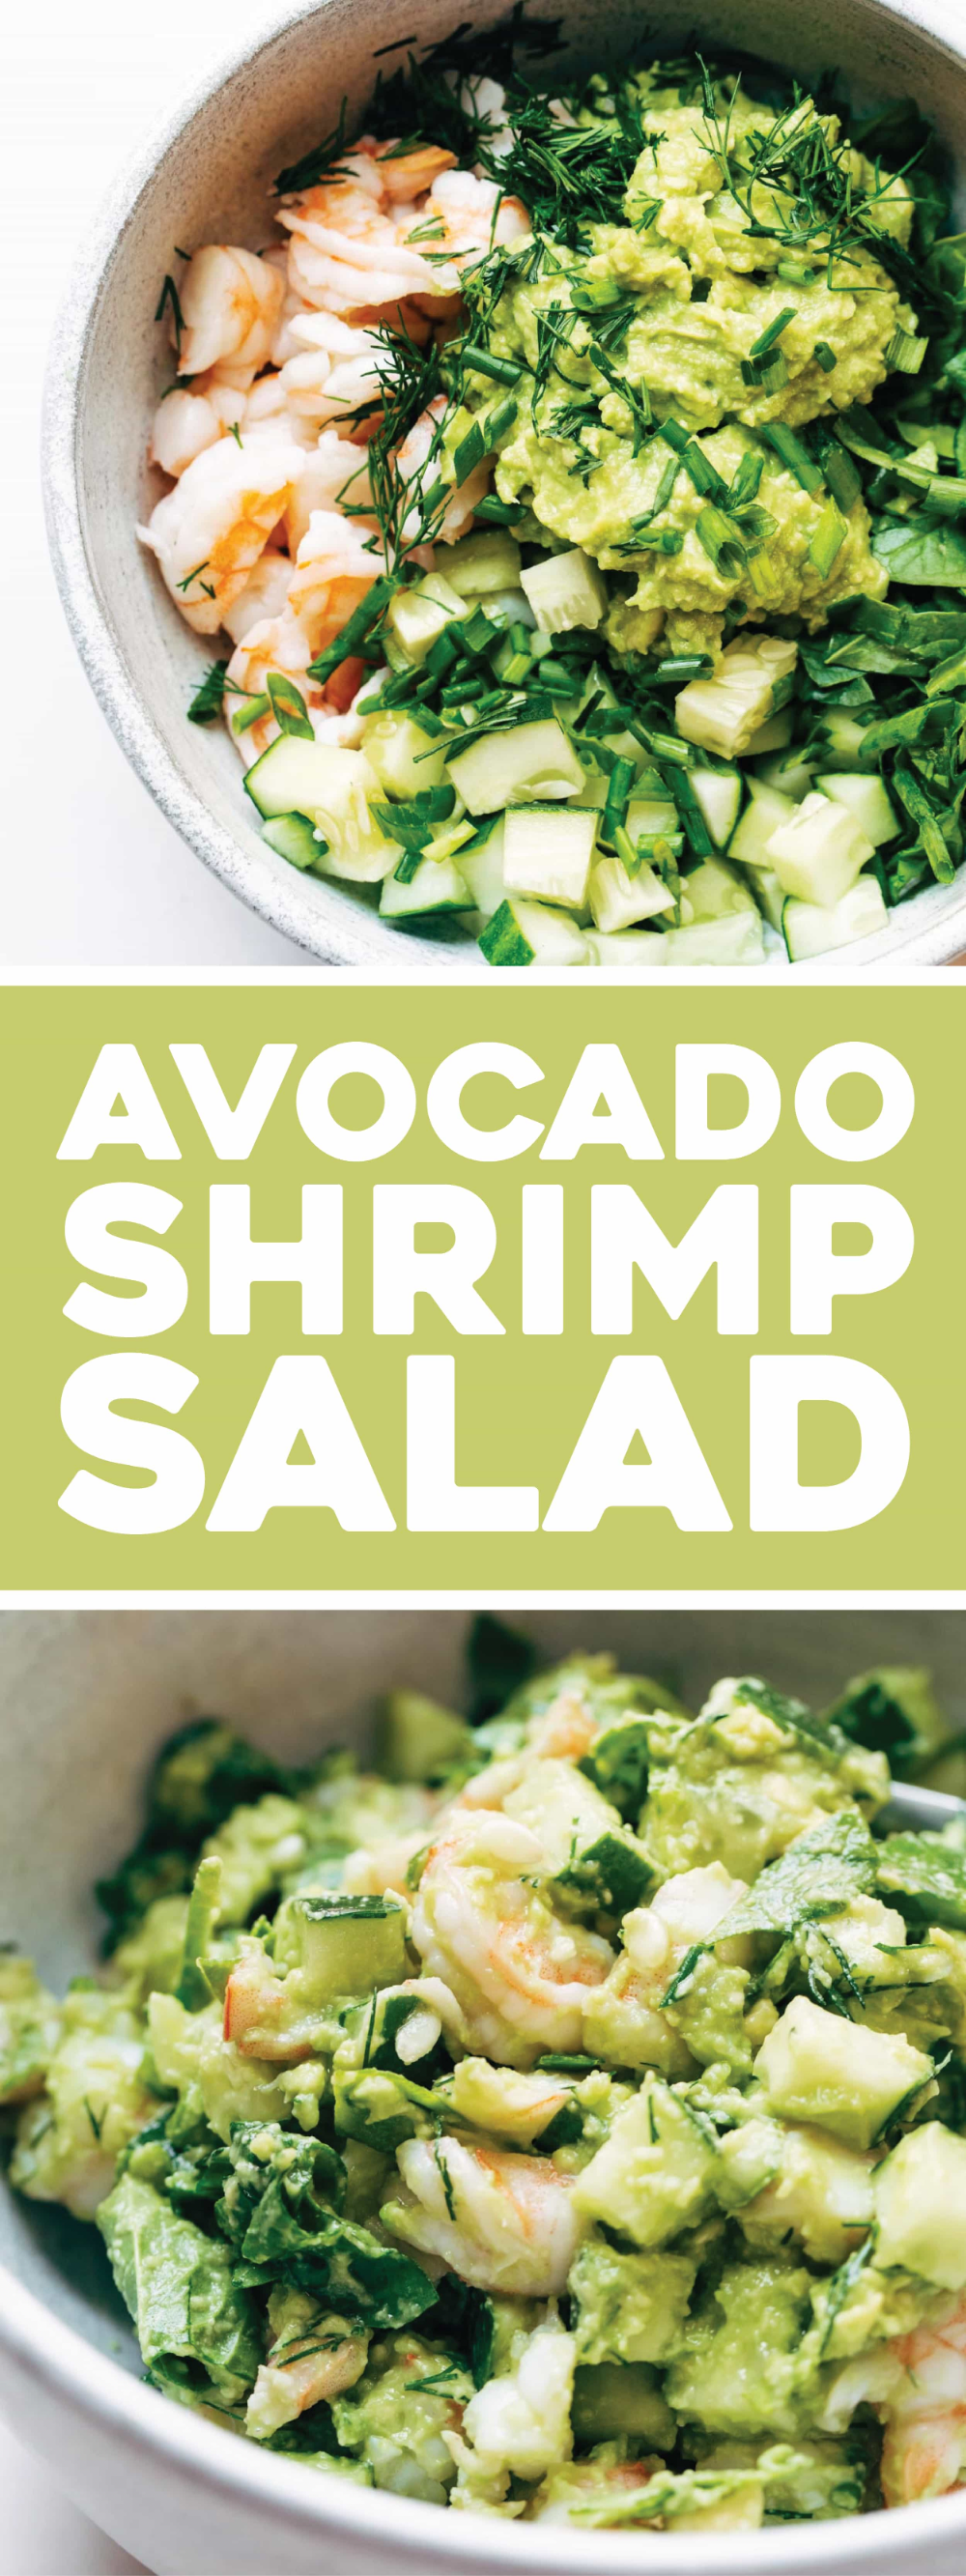 Super Quick Avocado Shrimp Salad